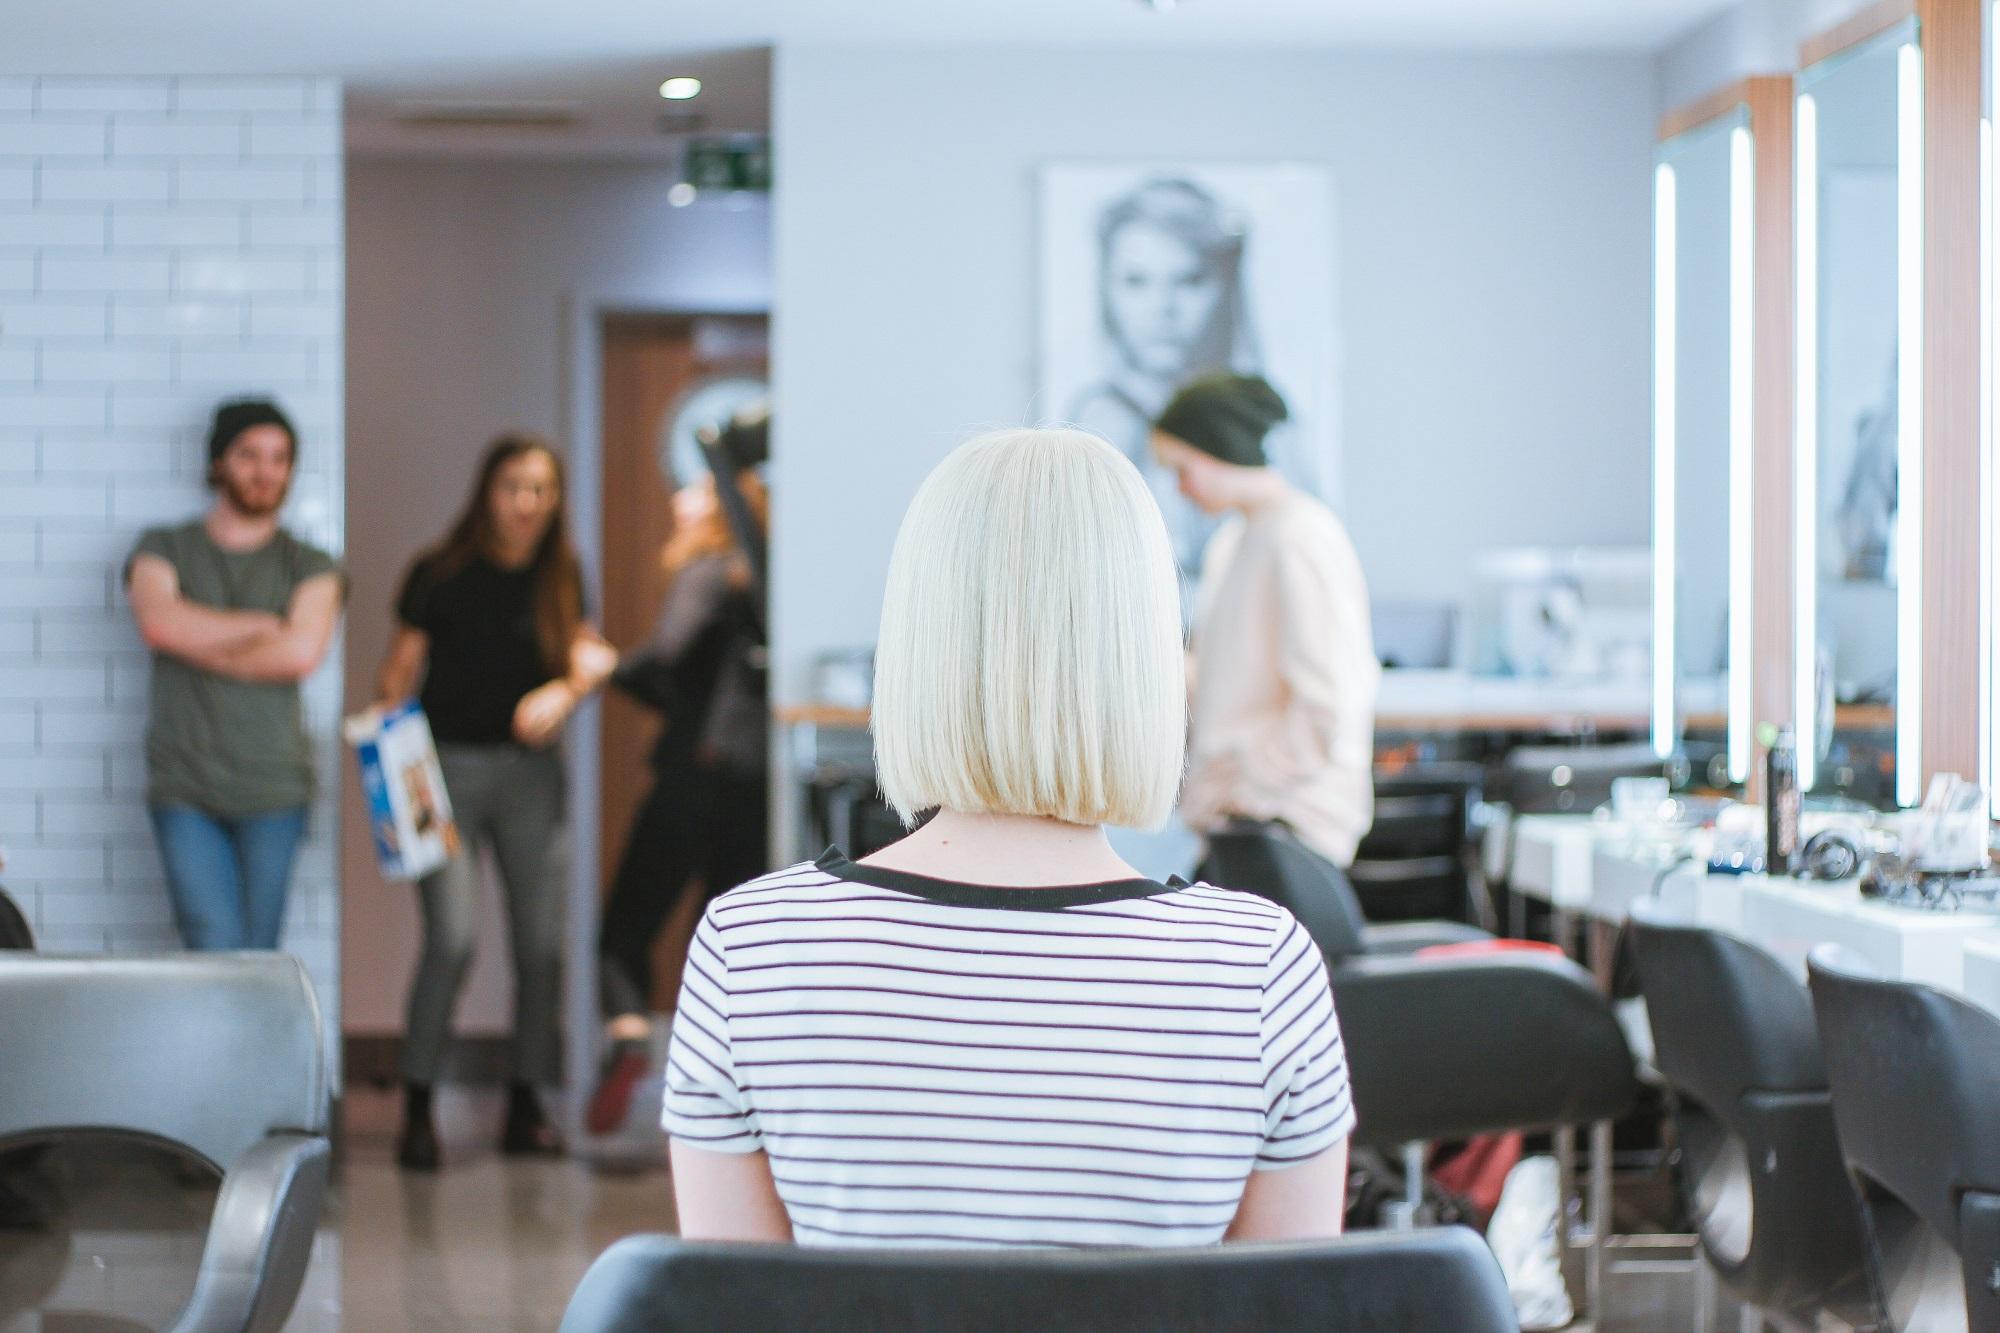 Lucruri pe care hairstilistii ar vrea sa le stie clientii cand vin la salon